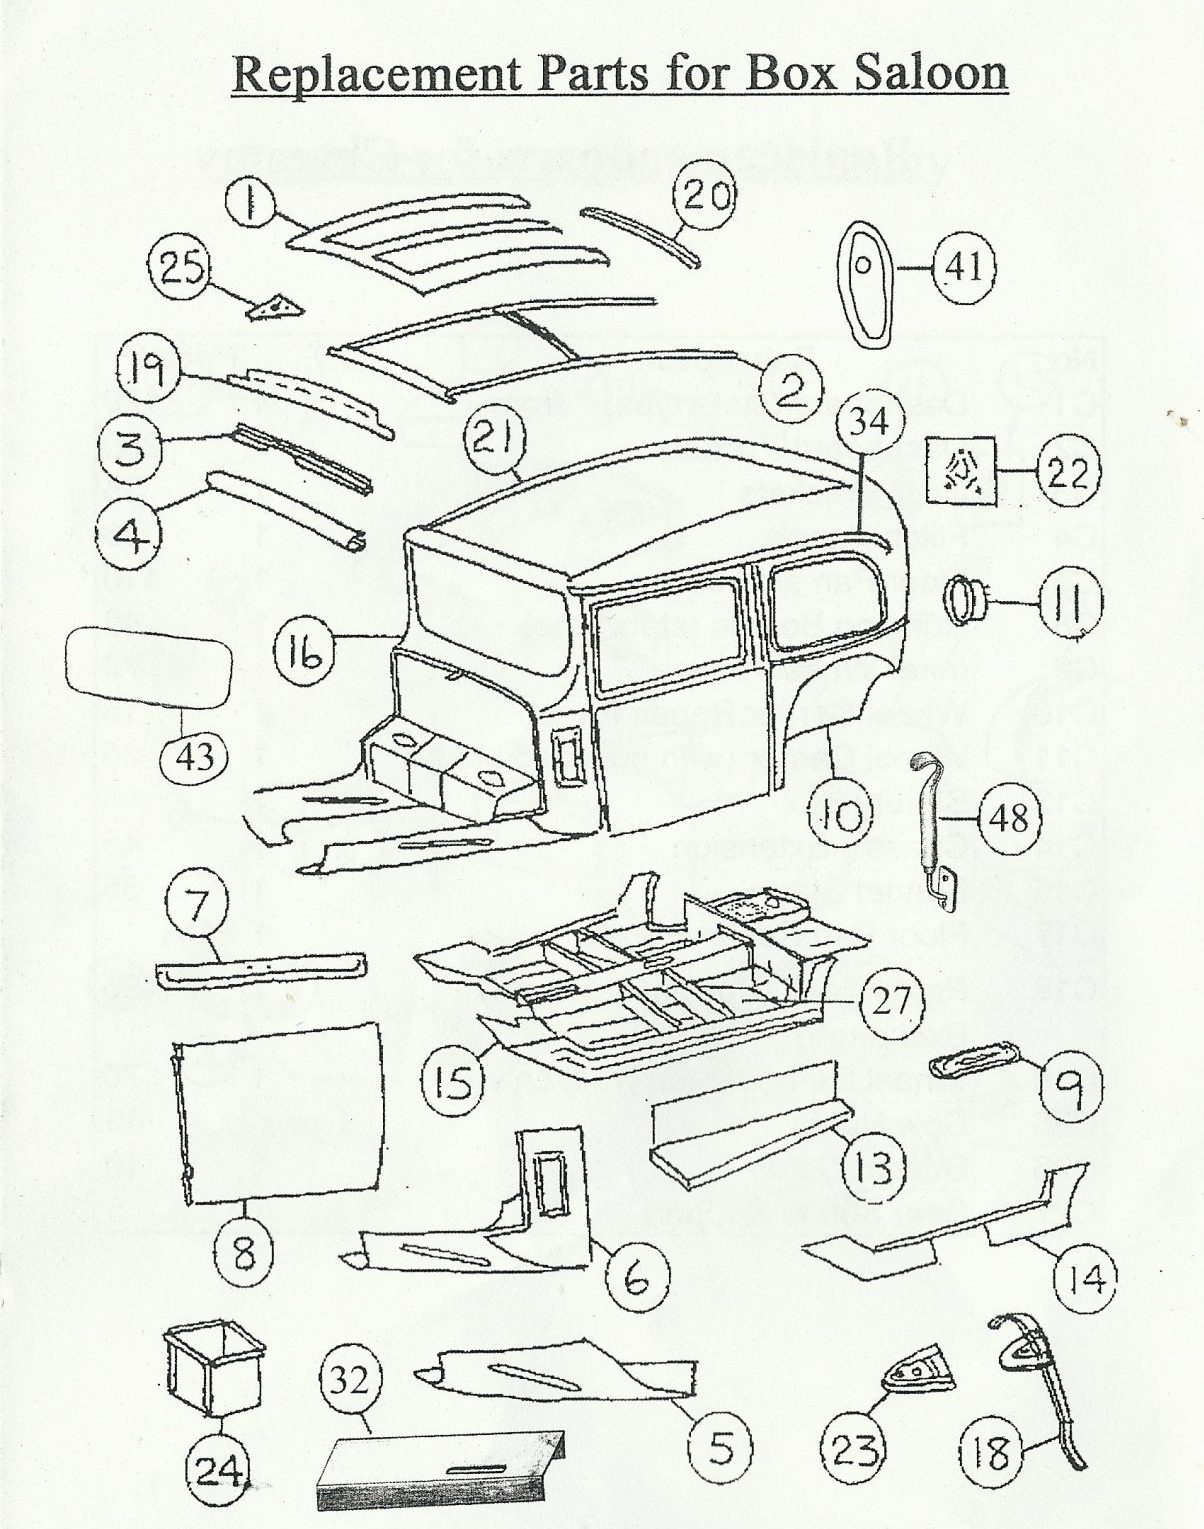 Austin Seven Box Saloon Body Parts And Panels